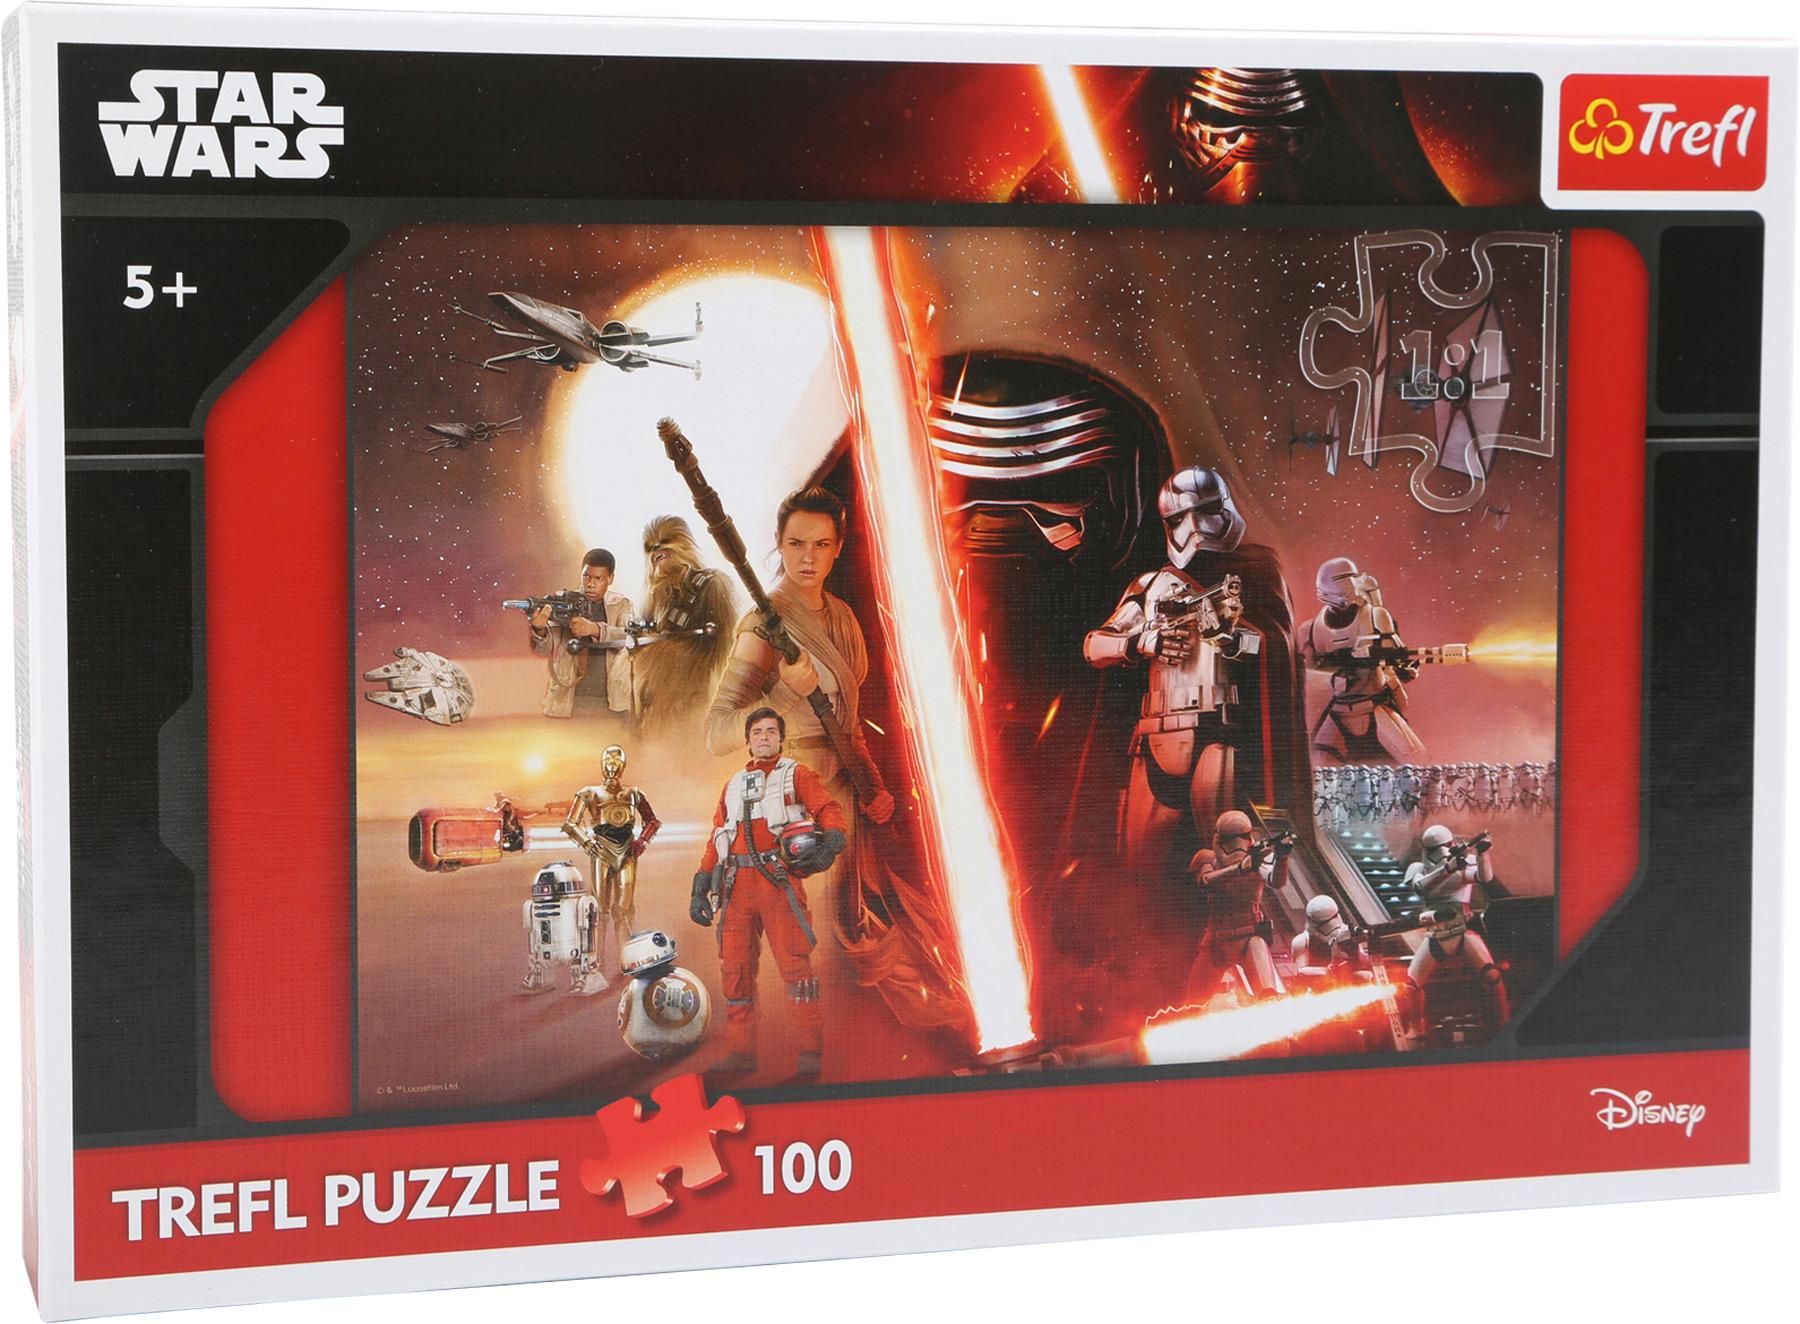 star wars 100 piece puzzle